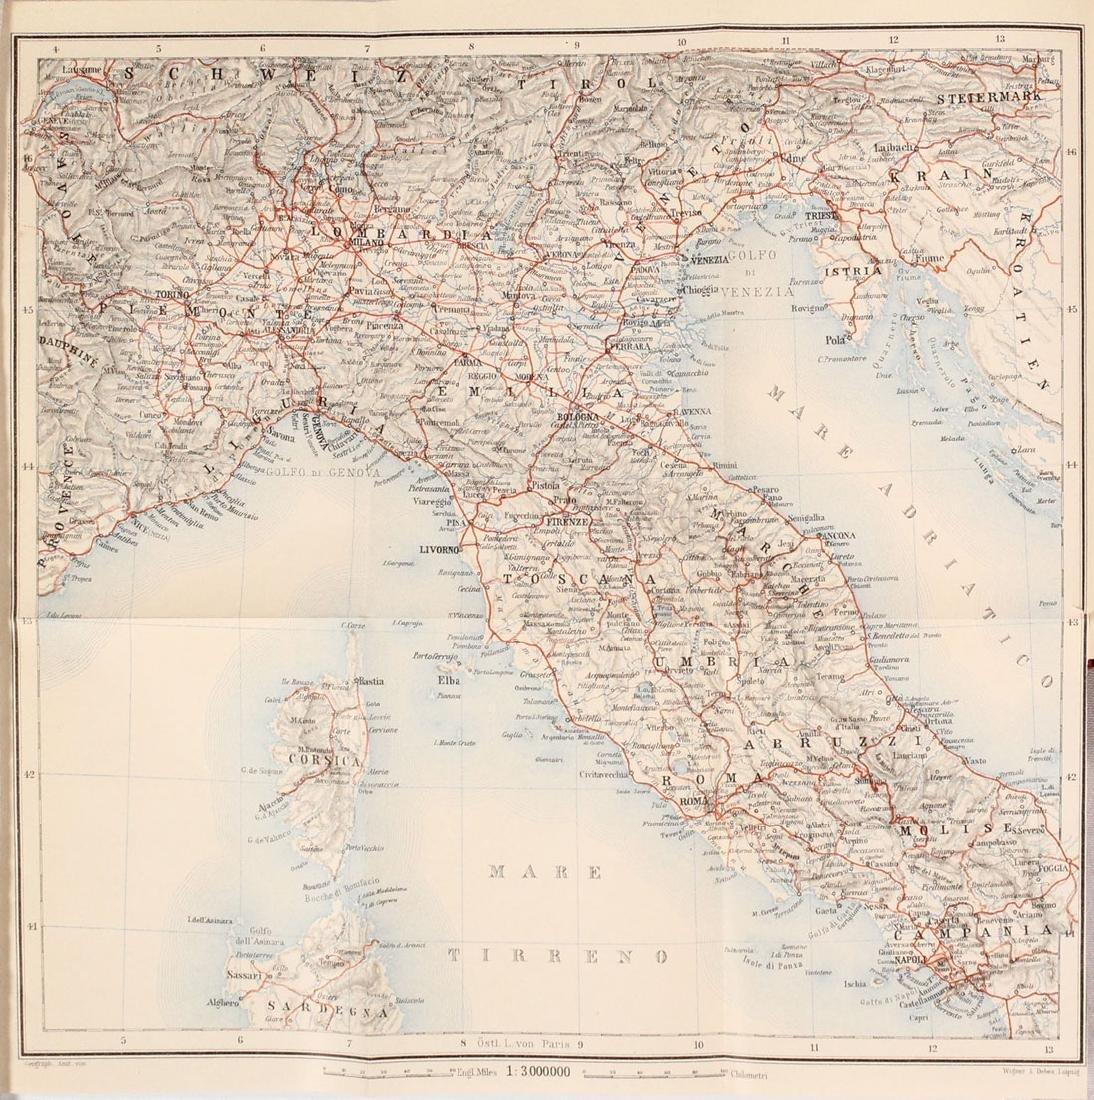 MAPS IN BOOK - Italy. Baedeker